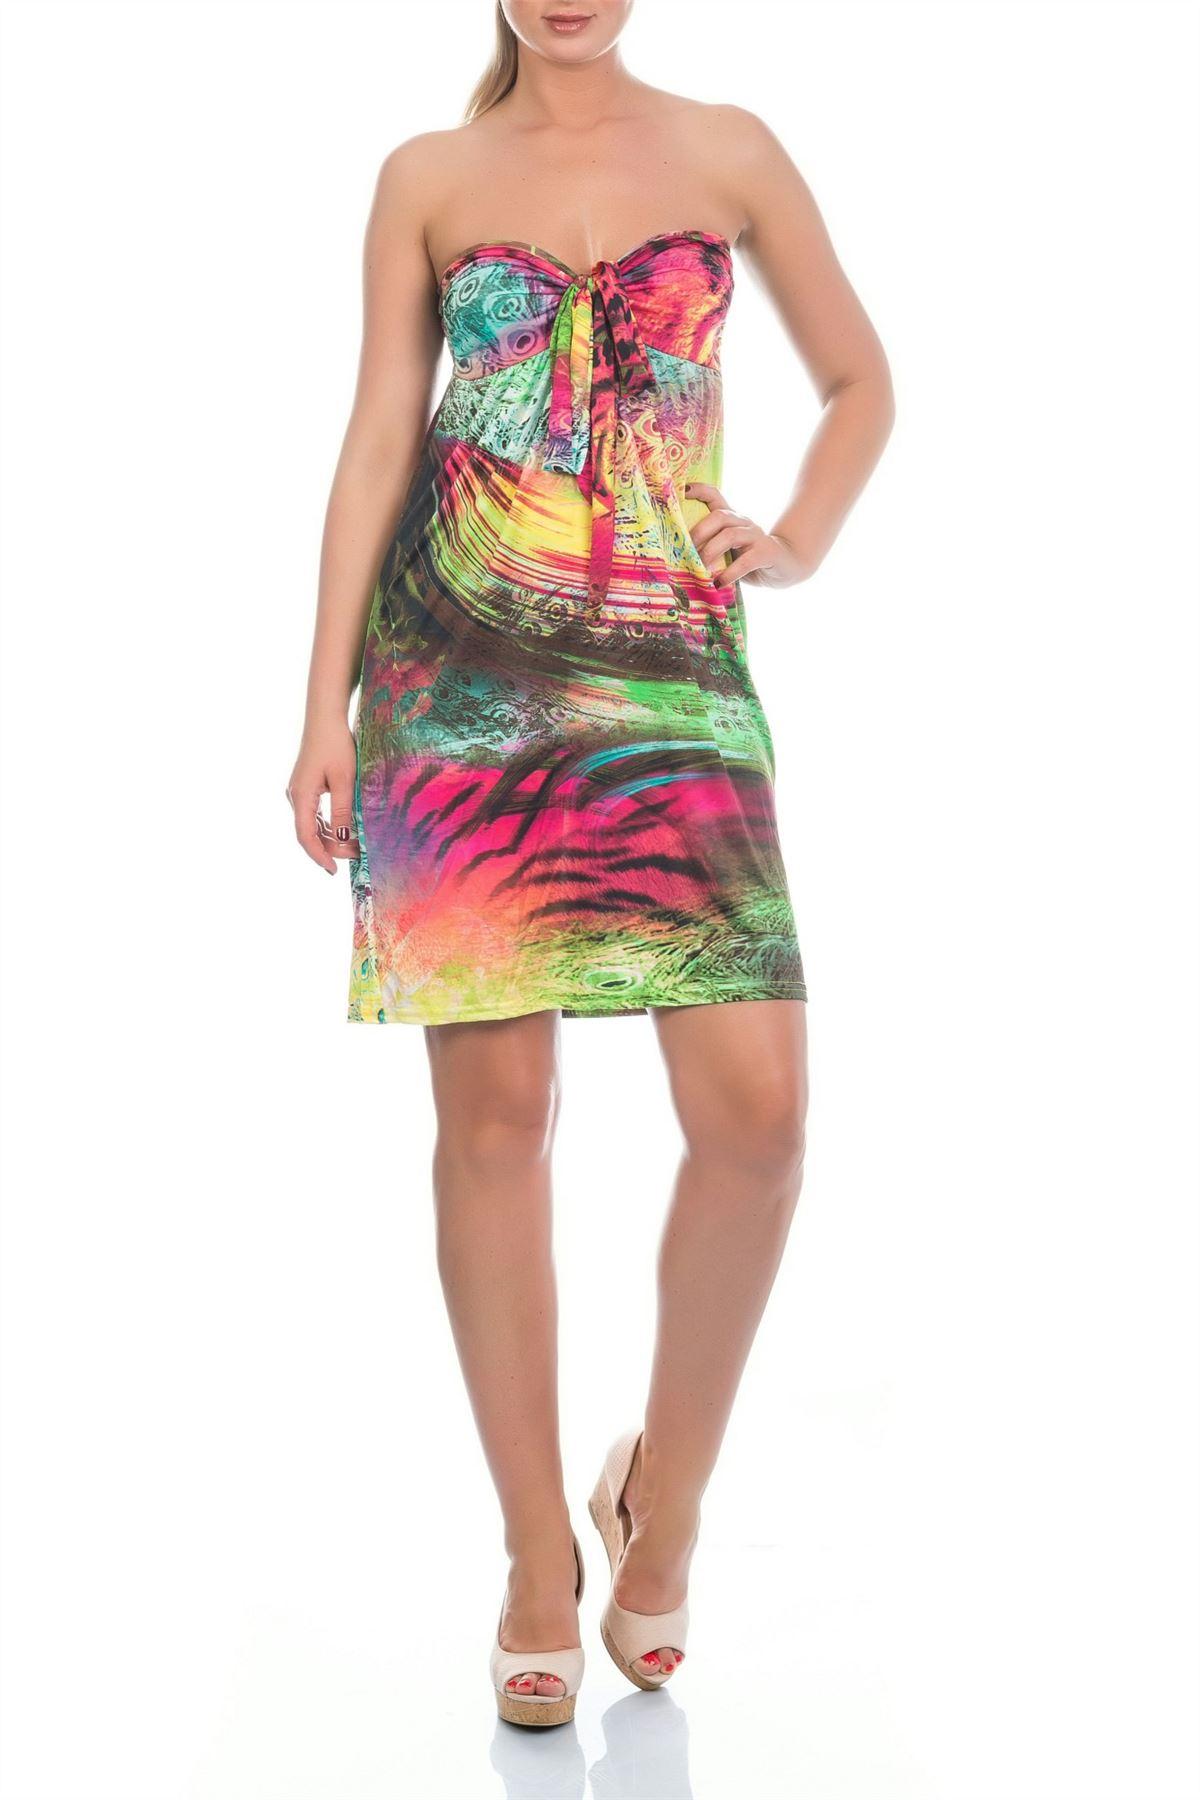 Martildo Womens Ladies Tropical Short Holiday Summer ...